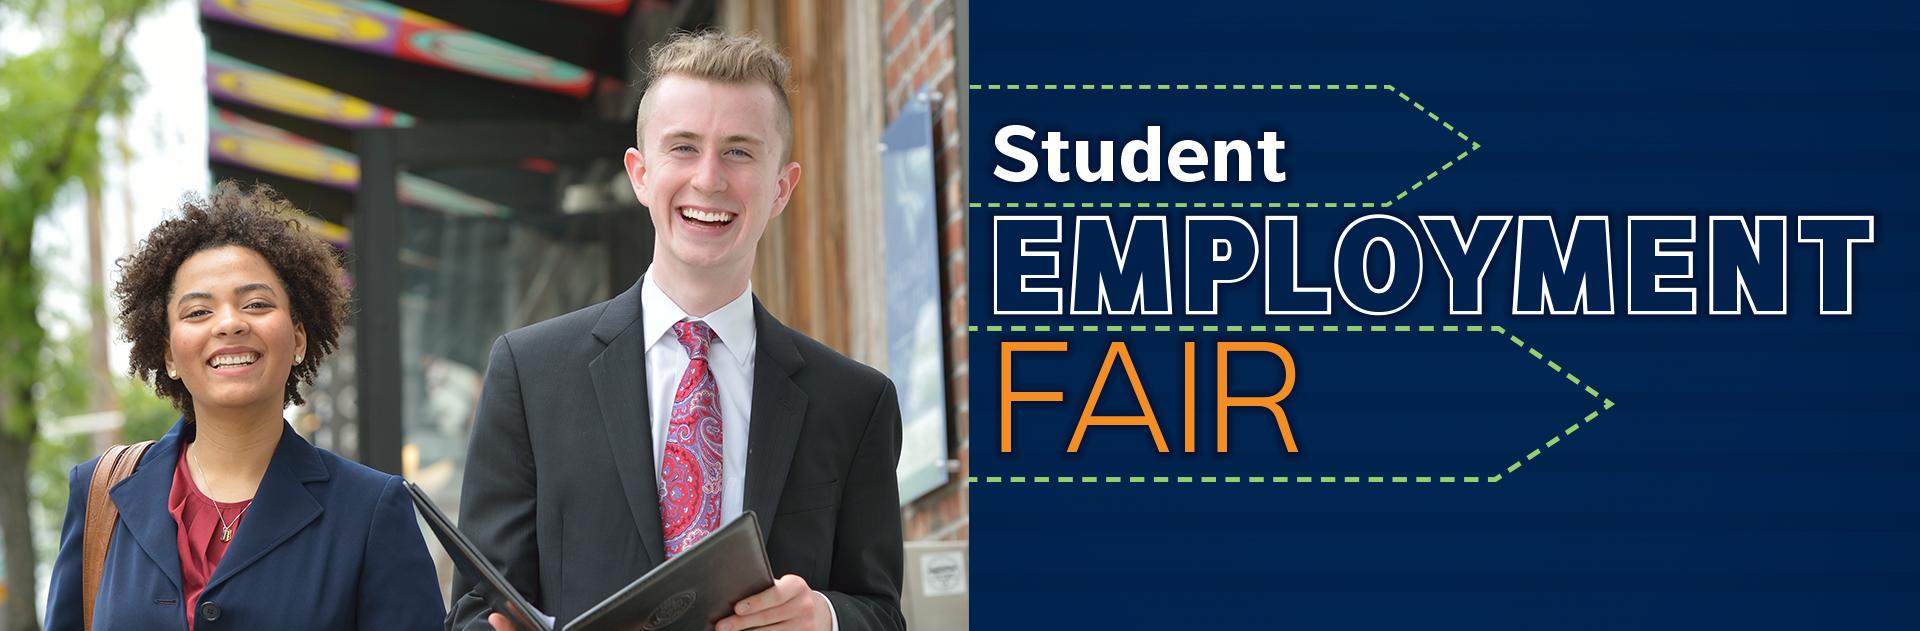 StudentEmploymentFair_WEB-1